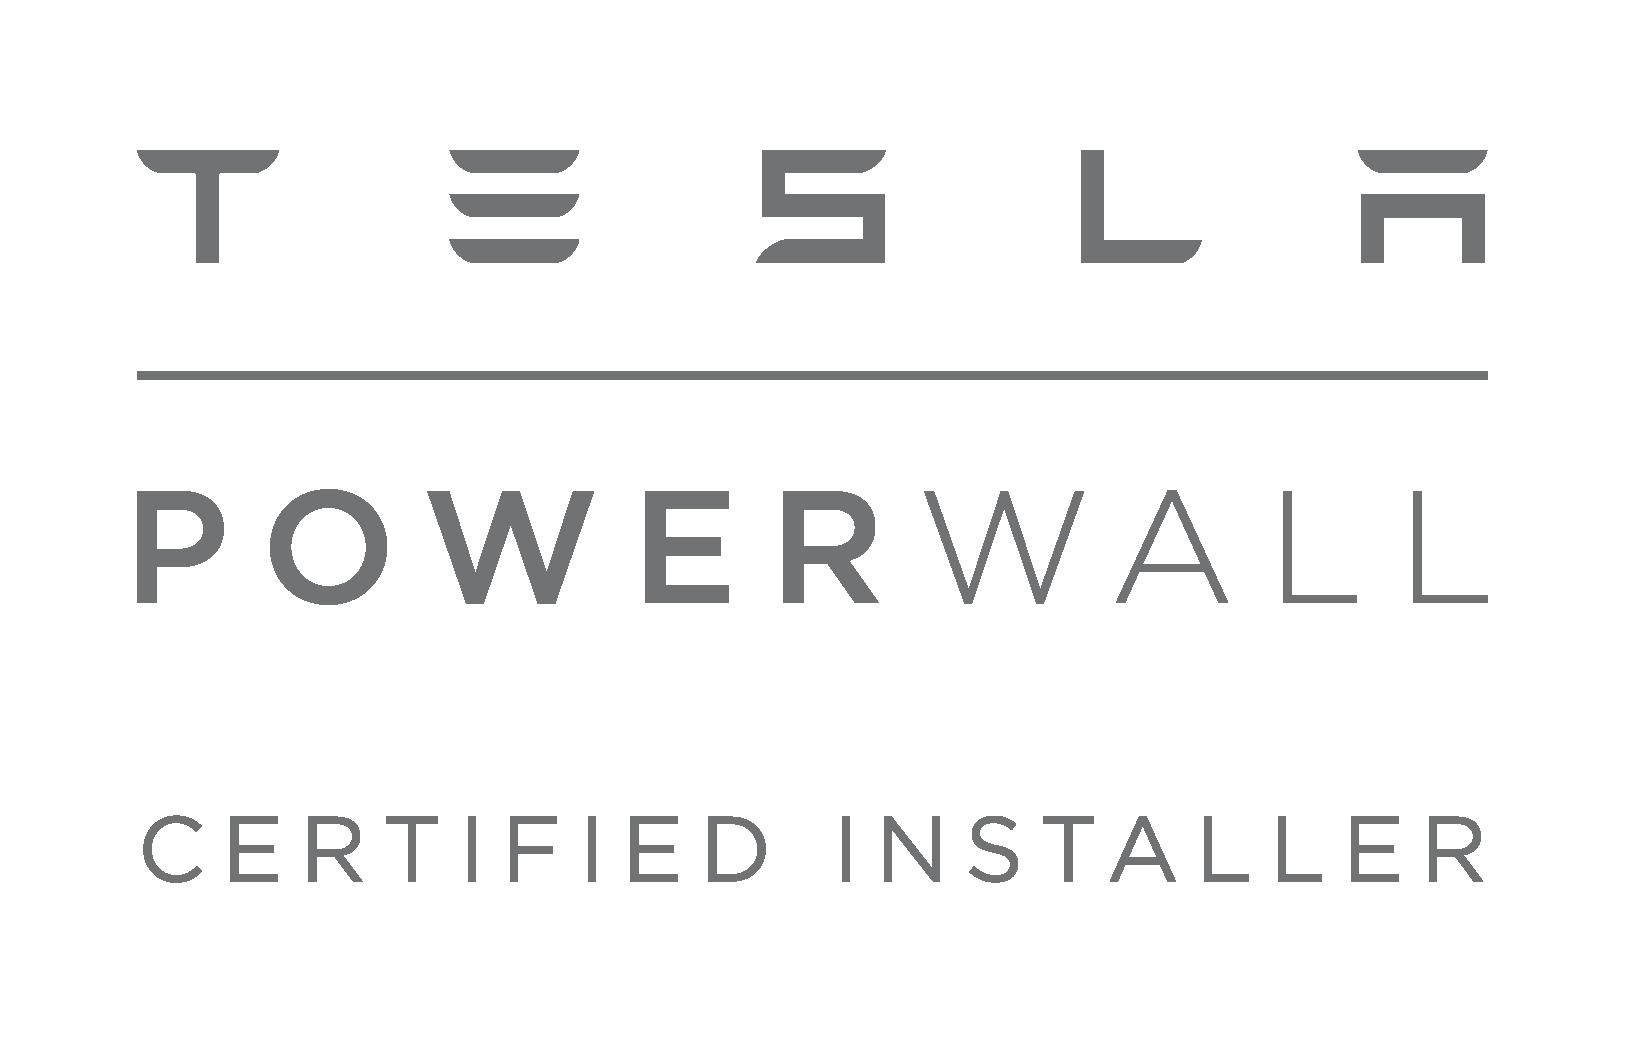 Tesla Powerwall Certified Installer Logo ozlooqhpmoow6n13vq1618l0isj0b0m7sysvhv877o - Solar Energy in Layman's Terms - Part Two